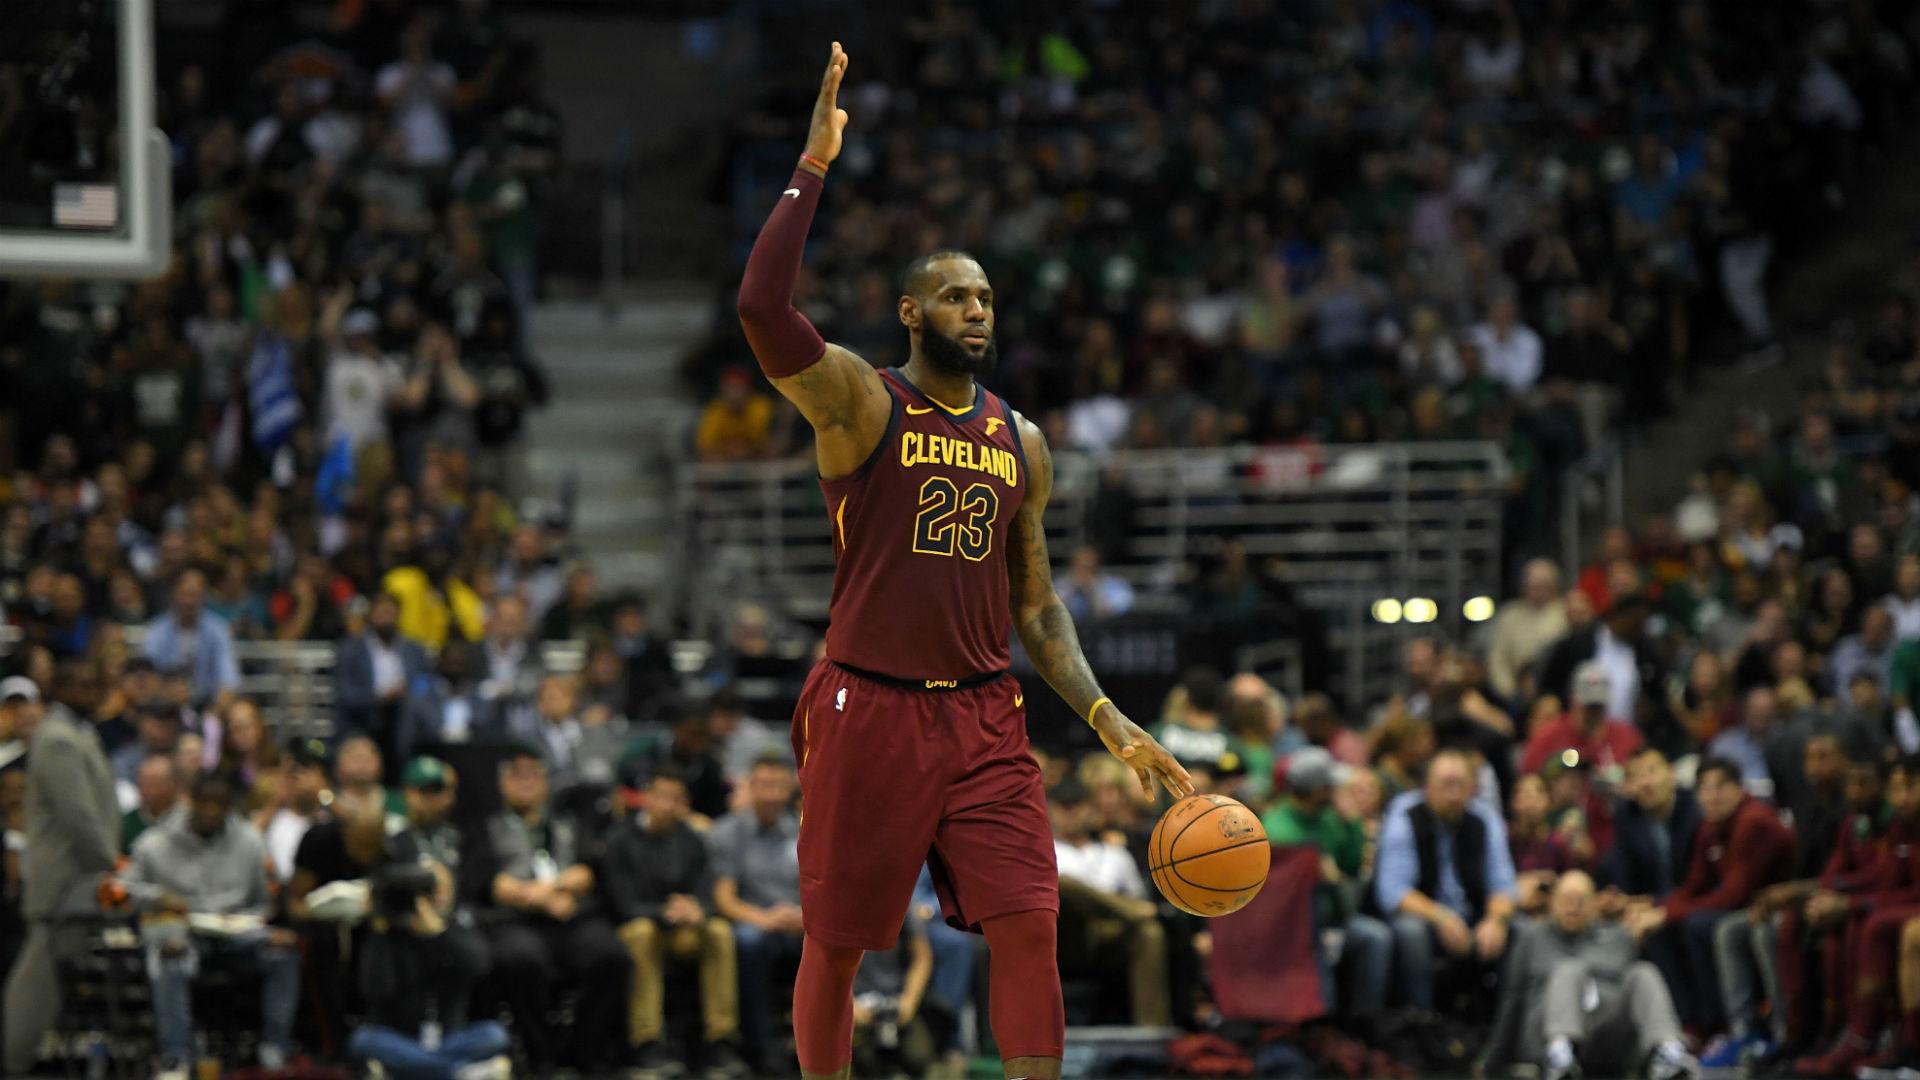 LeBron James names his final goal for NBA career